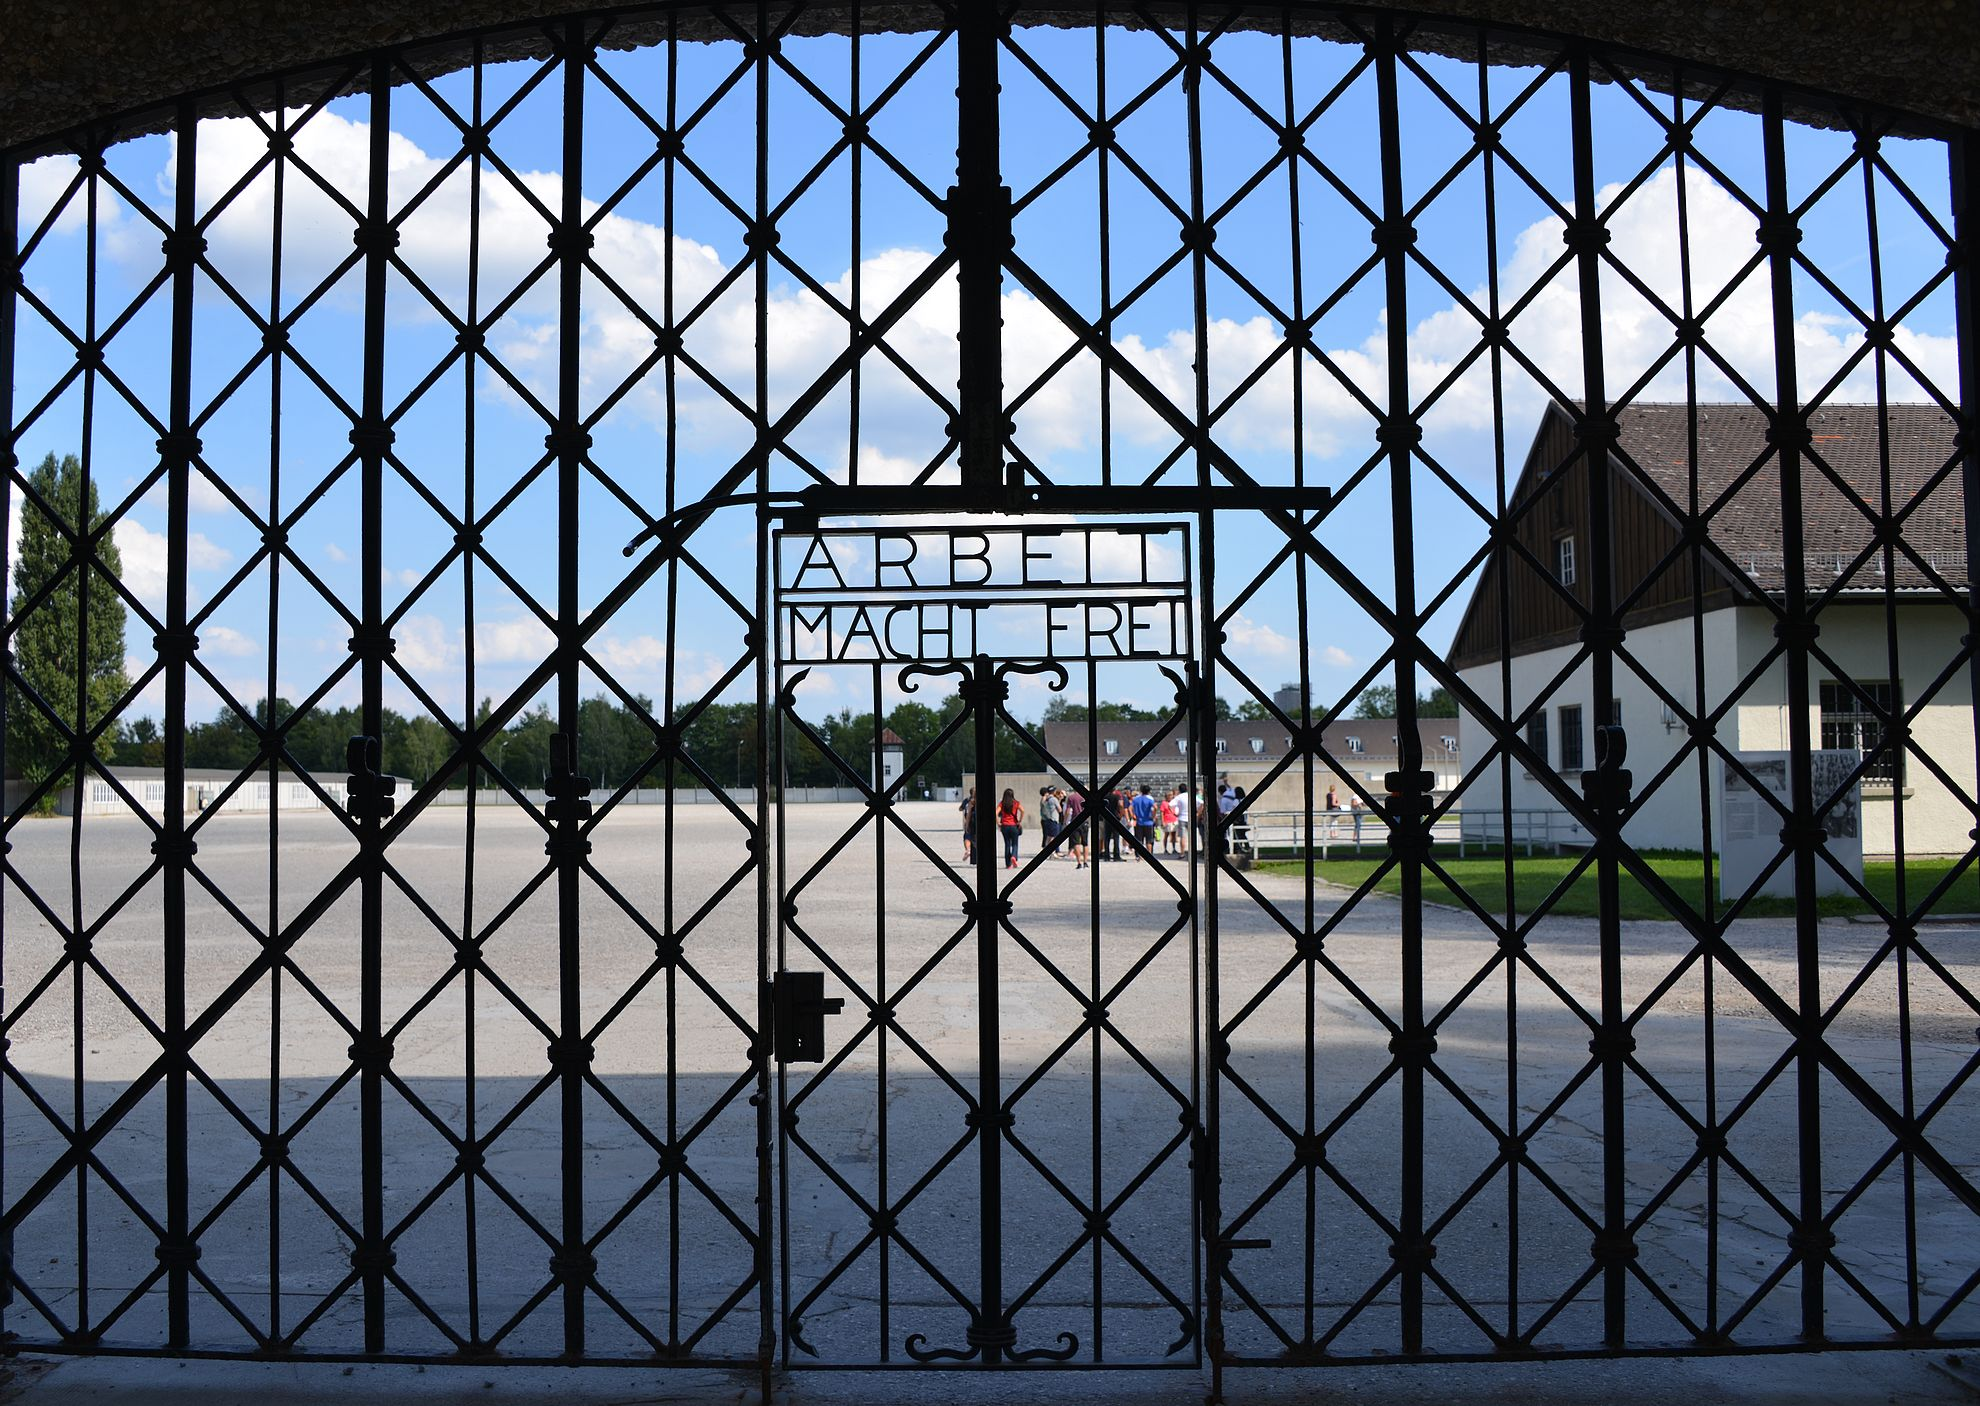 Dachau - Arbeit Macht Frei.